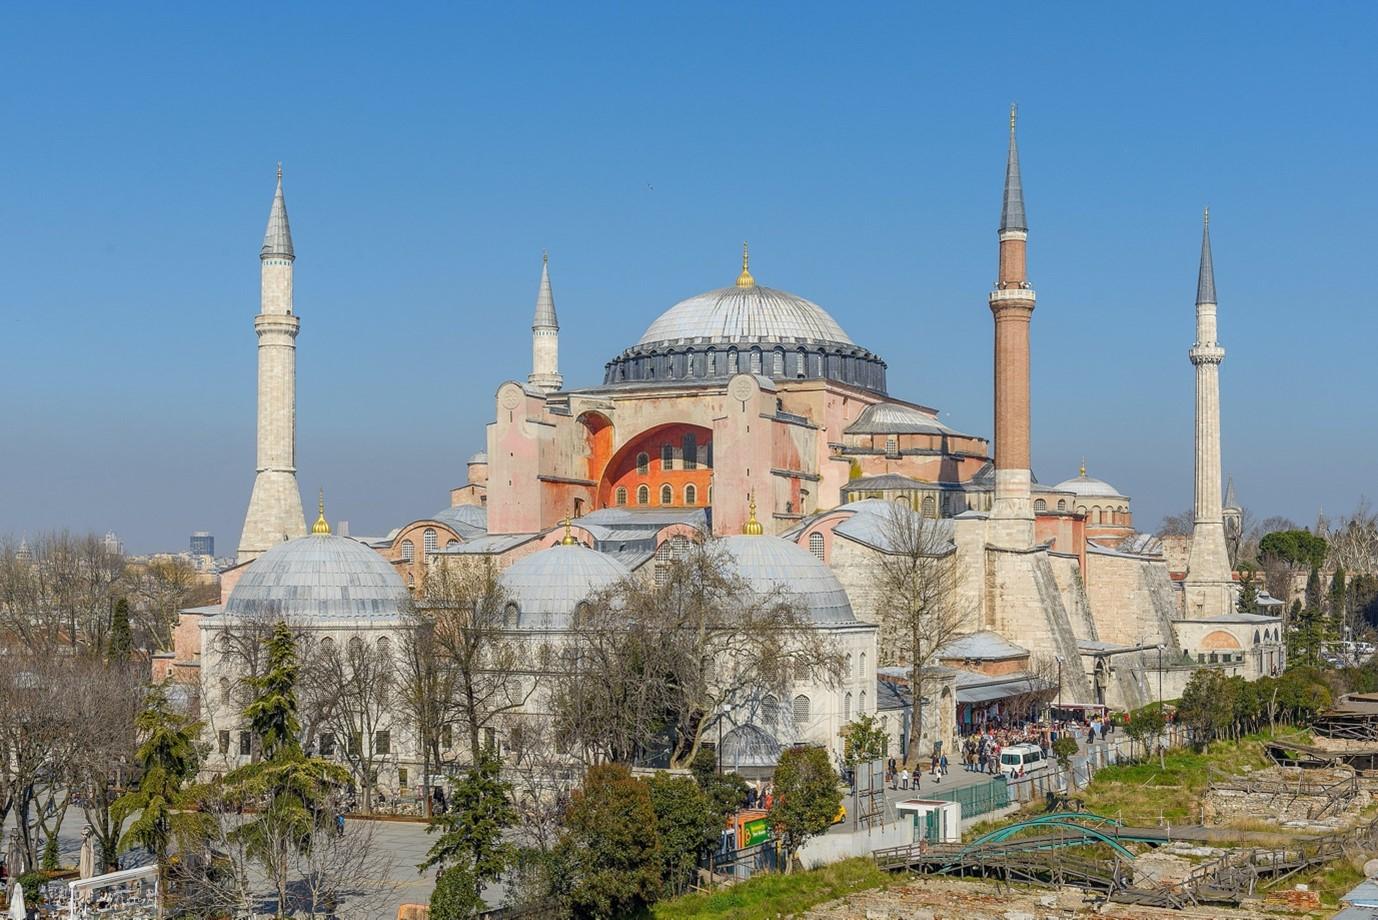 Hagia Sophia, c. 537 AD, Istanbul, Turkey.